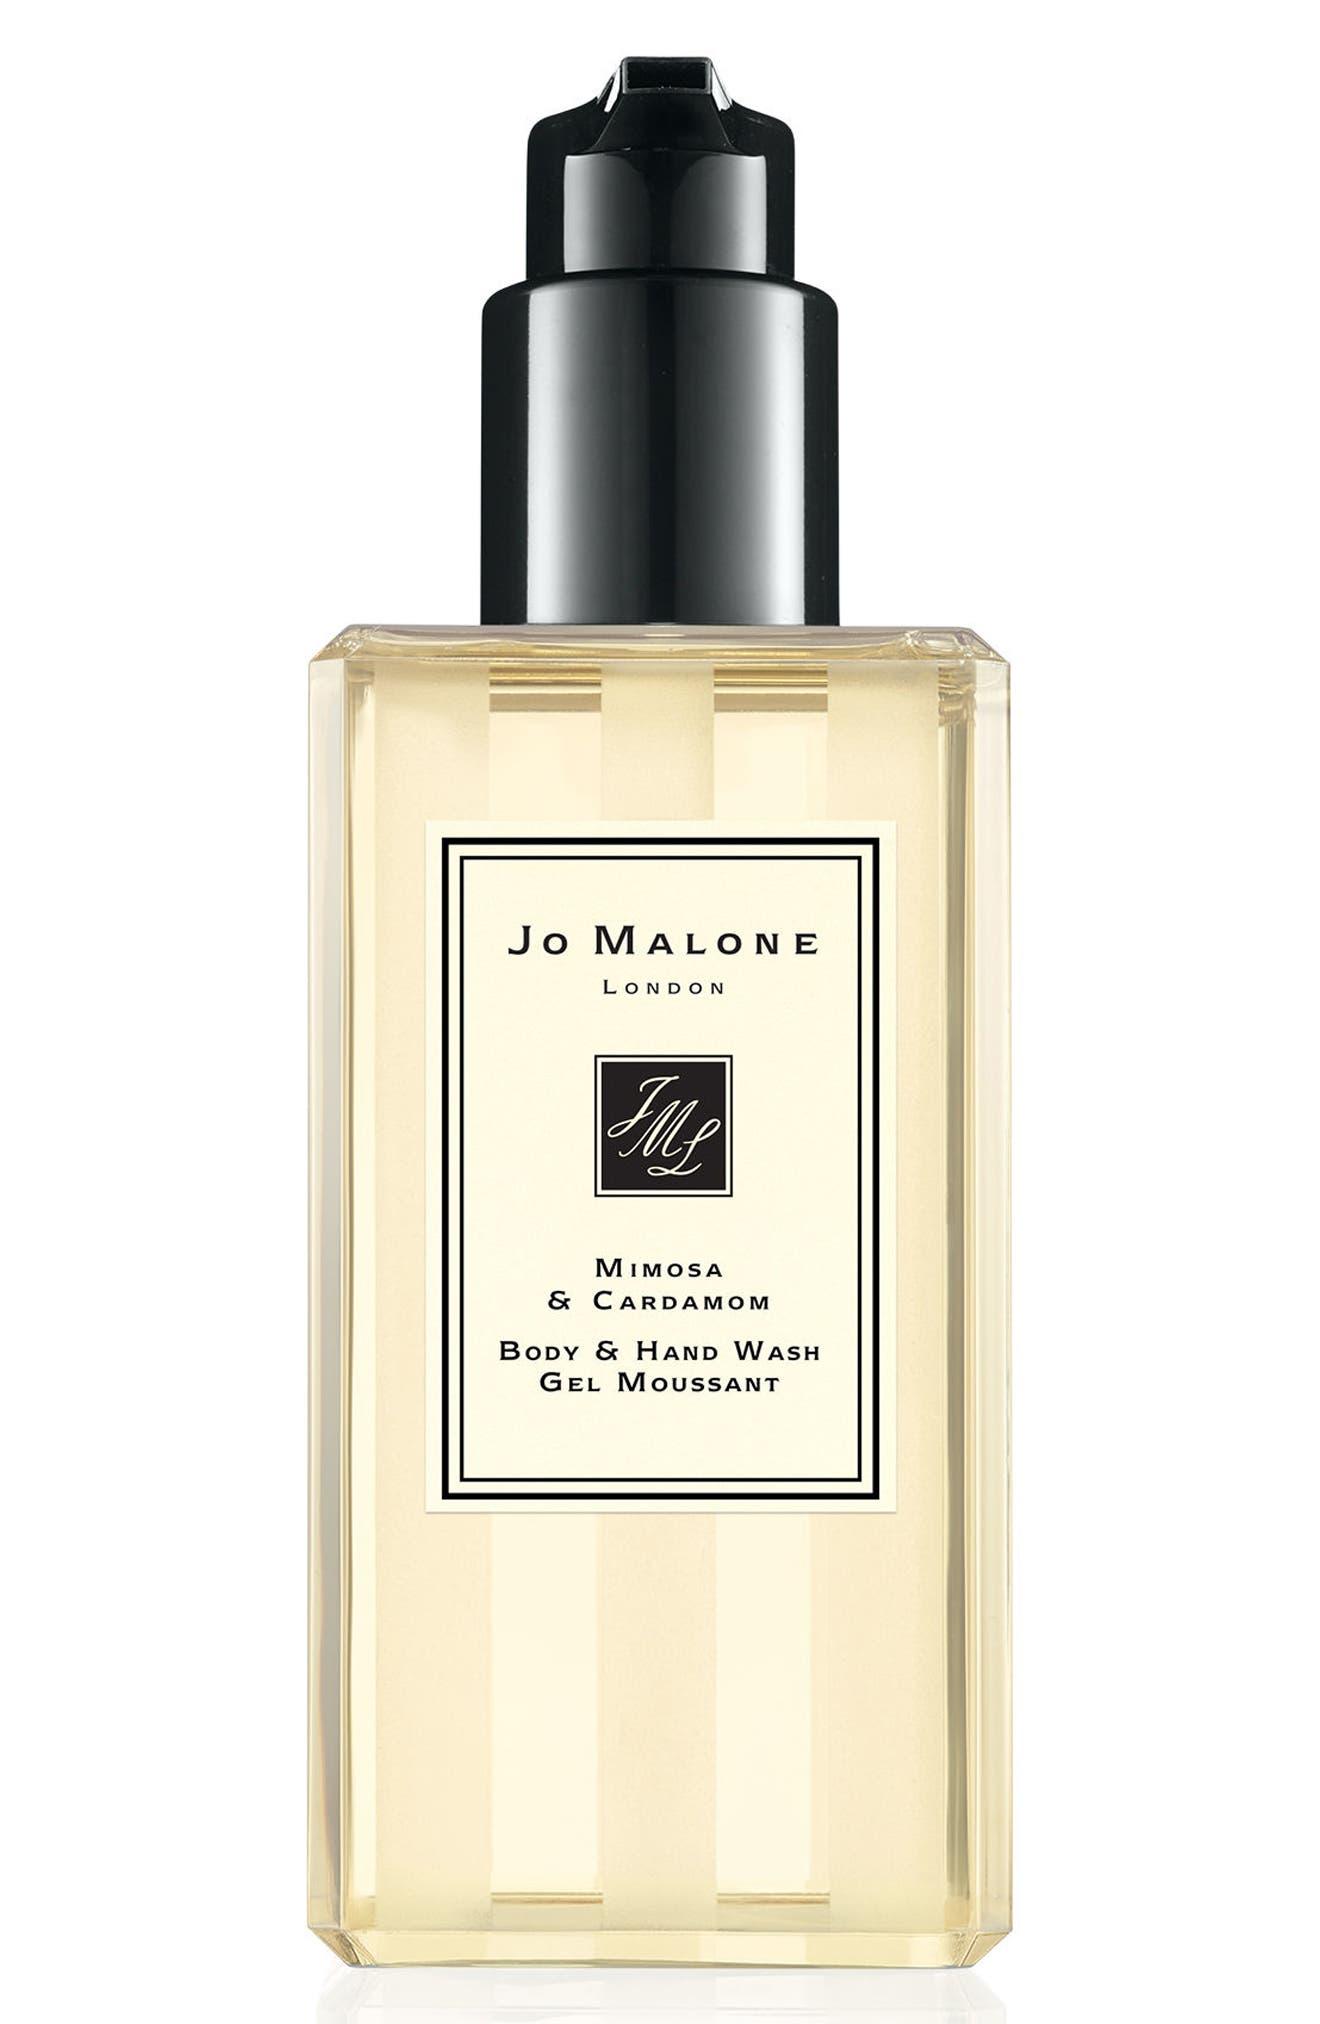 Jo Malone London(TM) Mimosa & Cardamom Body & Hand Wash